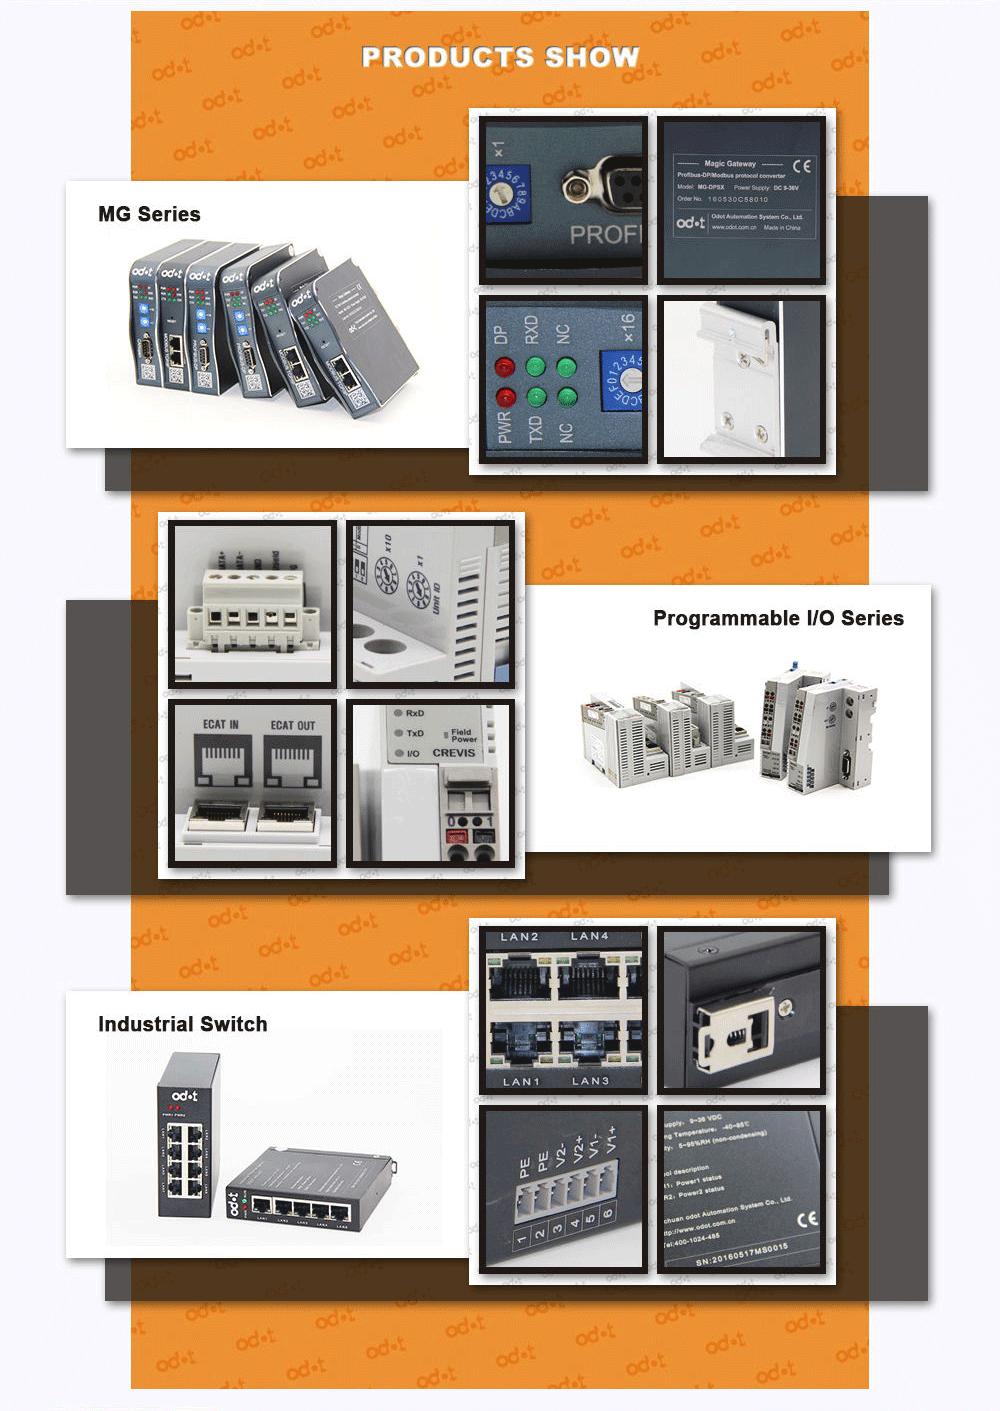 S7 protocol description